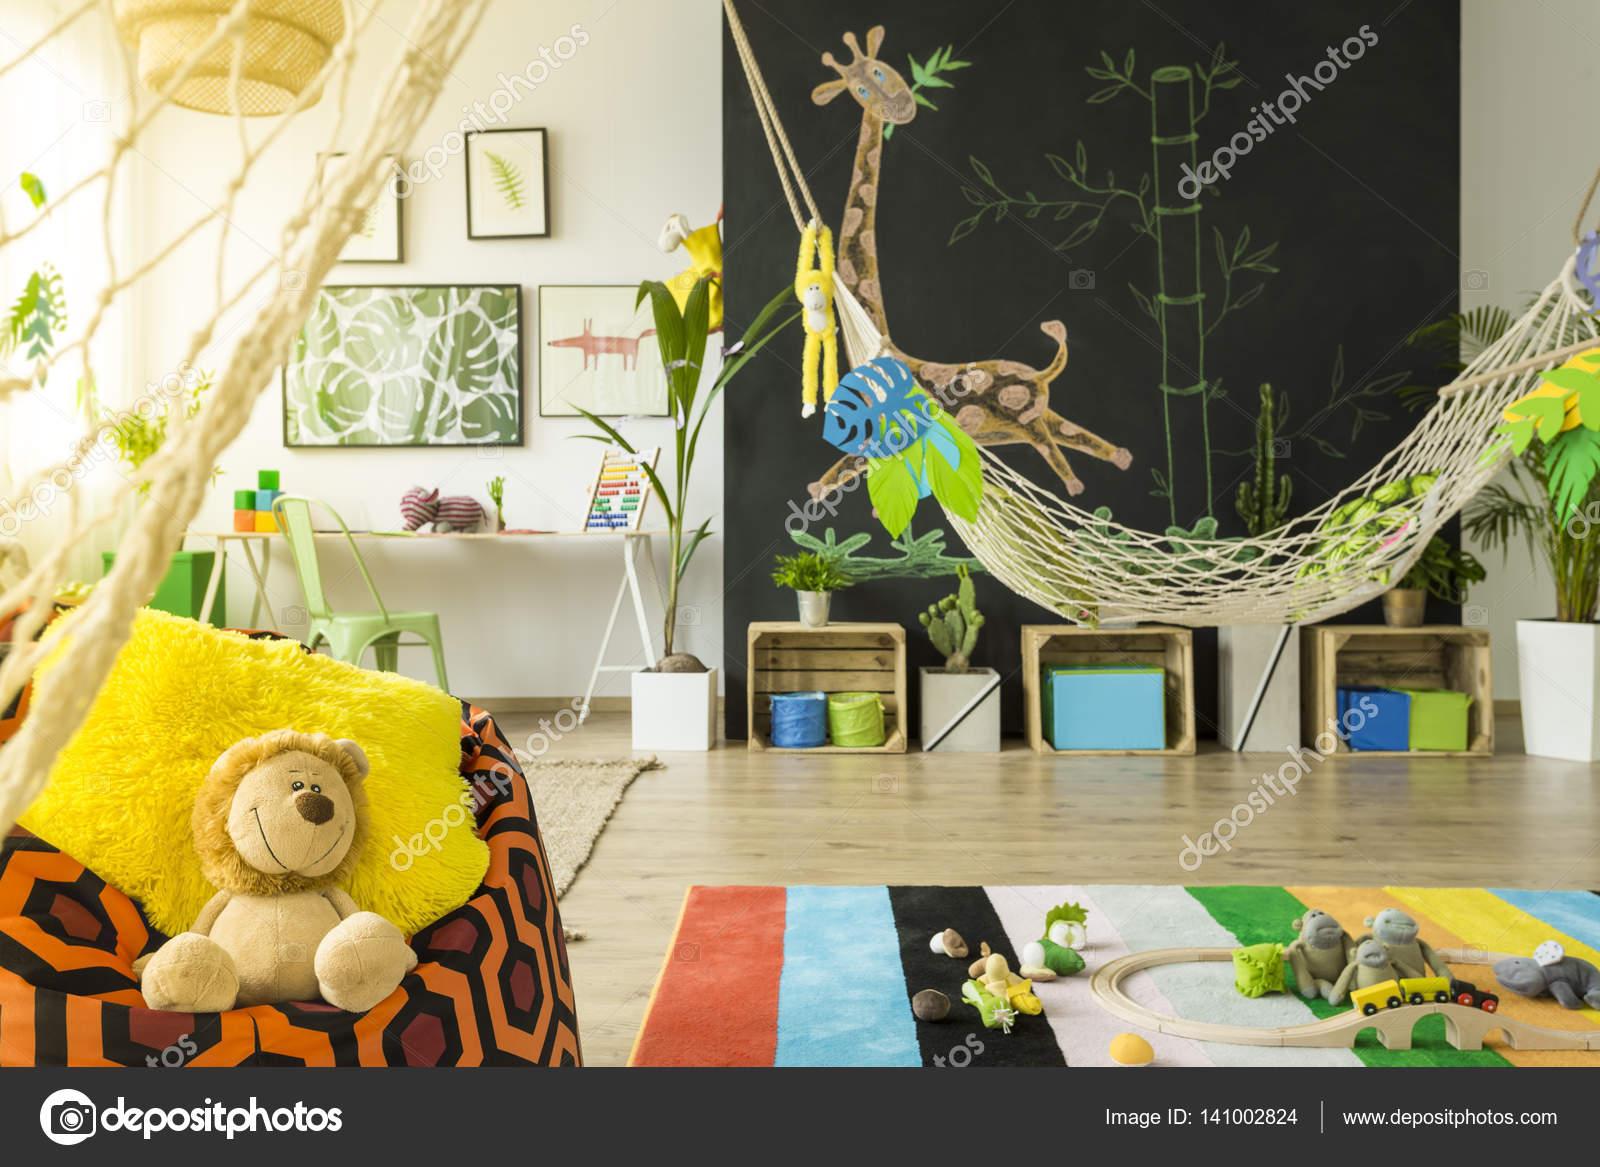 Jungle Decoratie Kinderkamer.Jungle Kinderkamer Met Hangmat Stockfoto C Photographee Eu 141002824